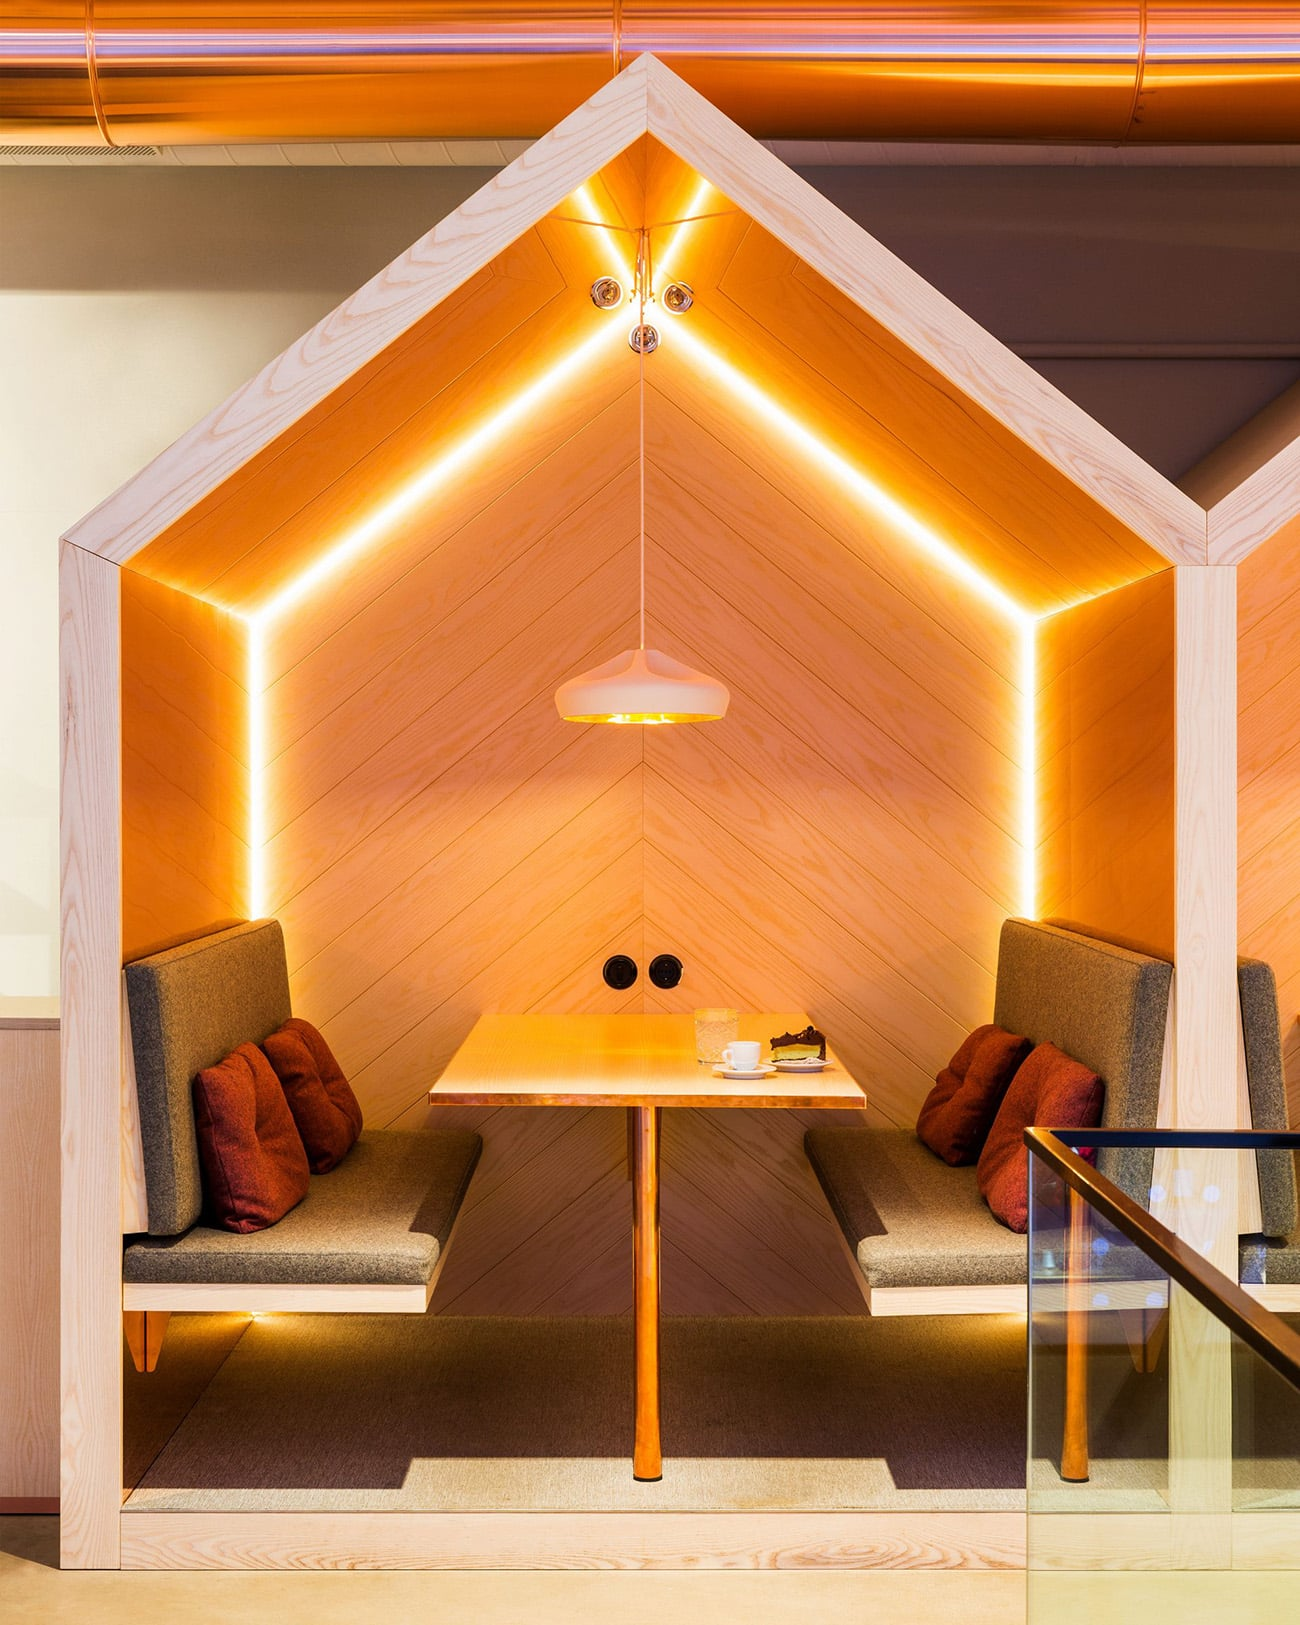 paulig kulma branding mindsparkle mag. Black Bedroom Furniture Sets. Home Design Ideas